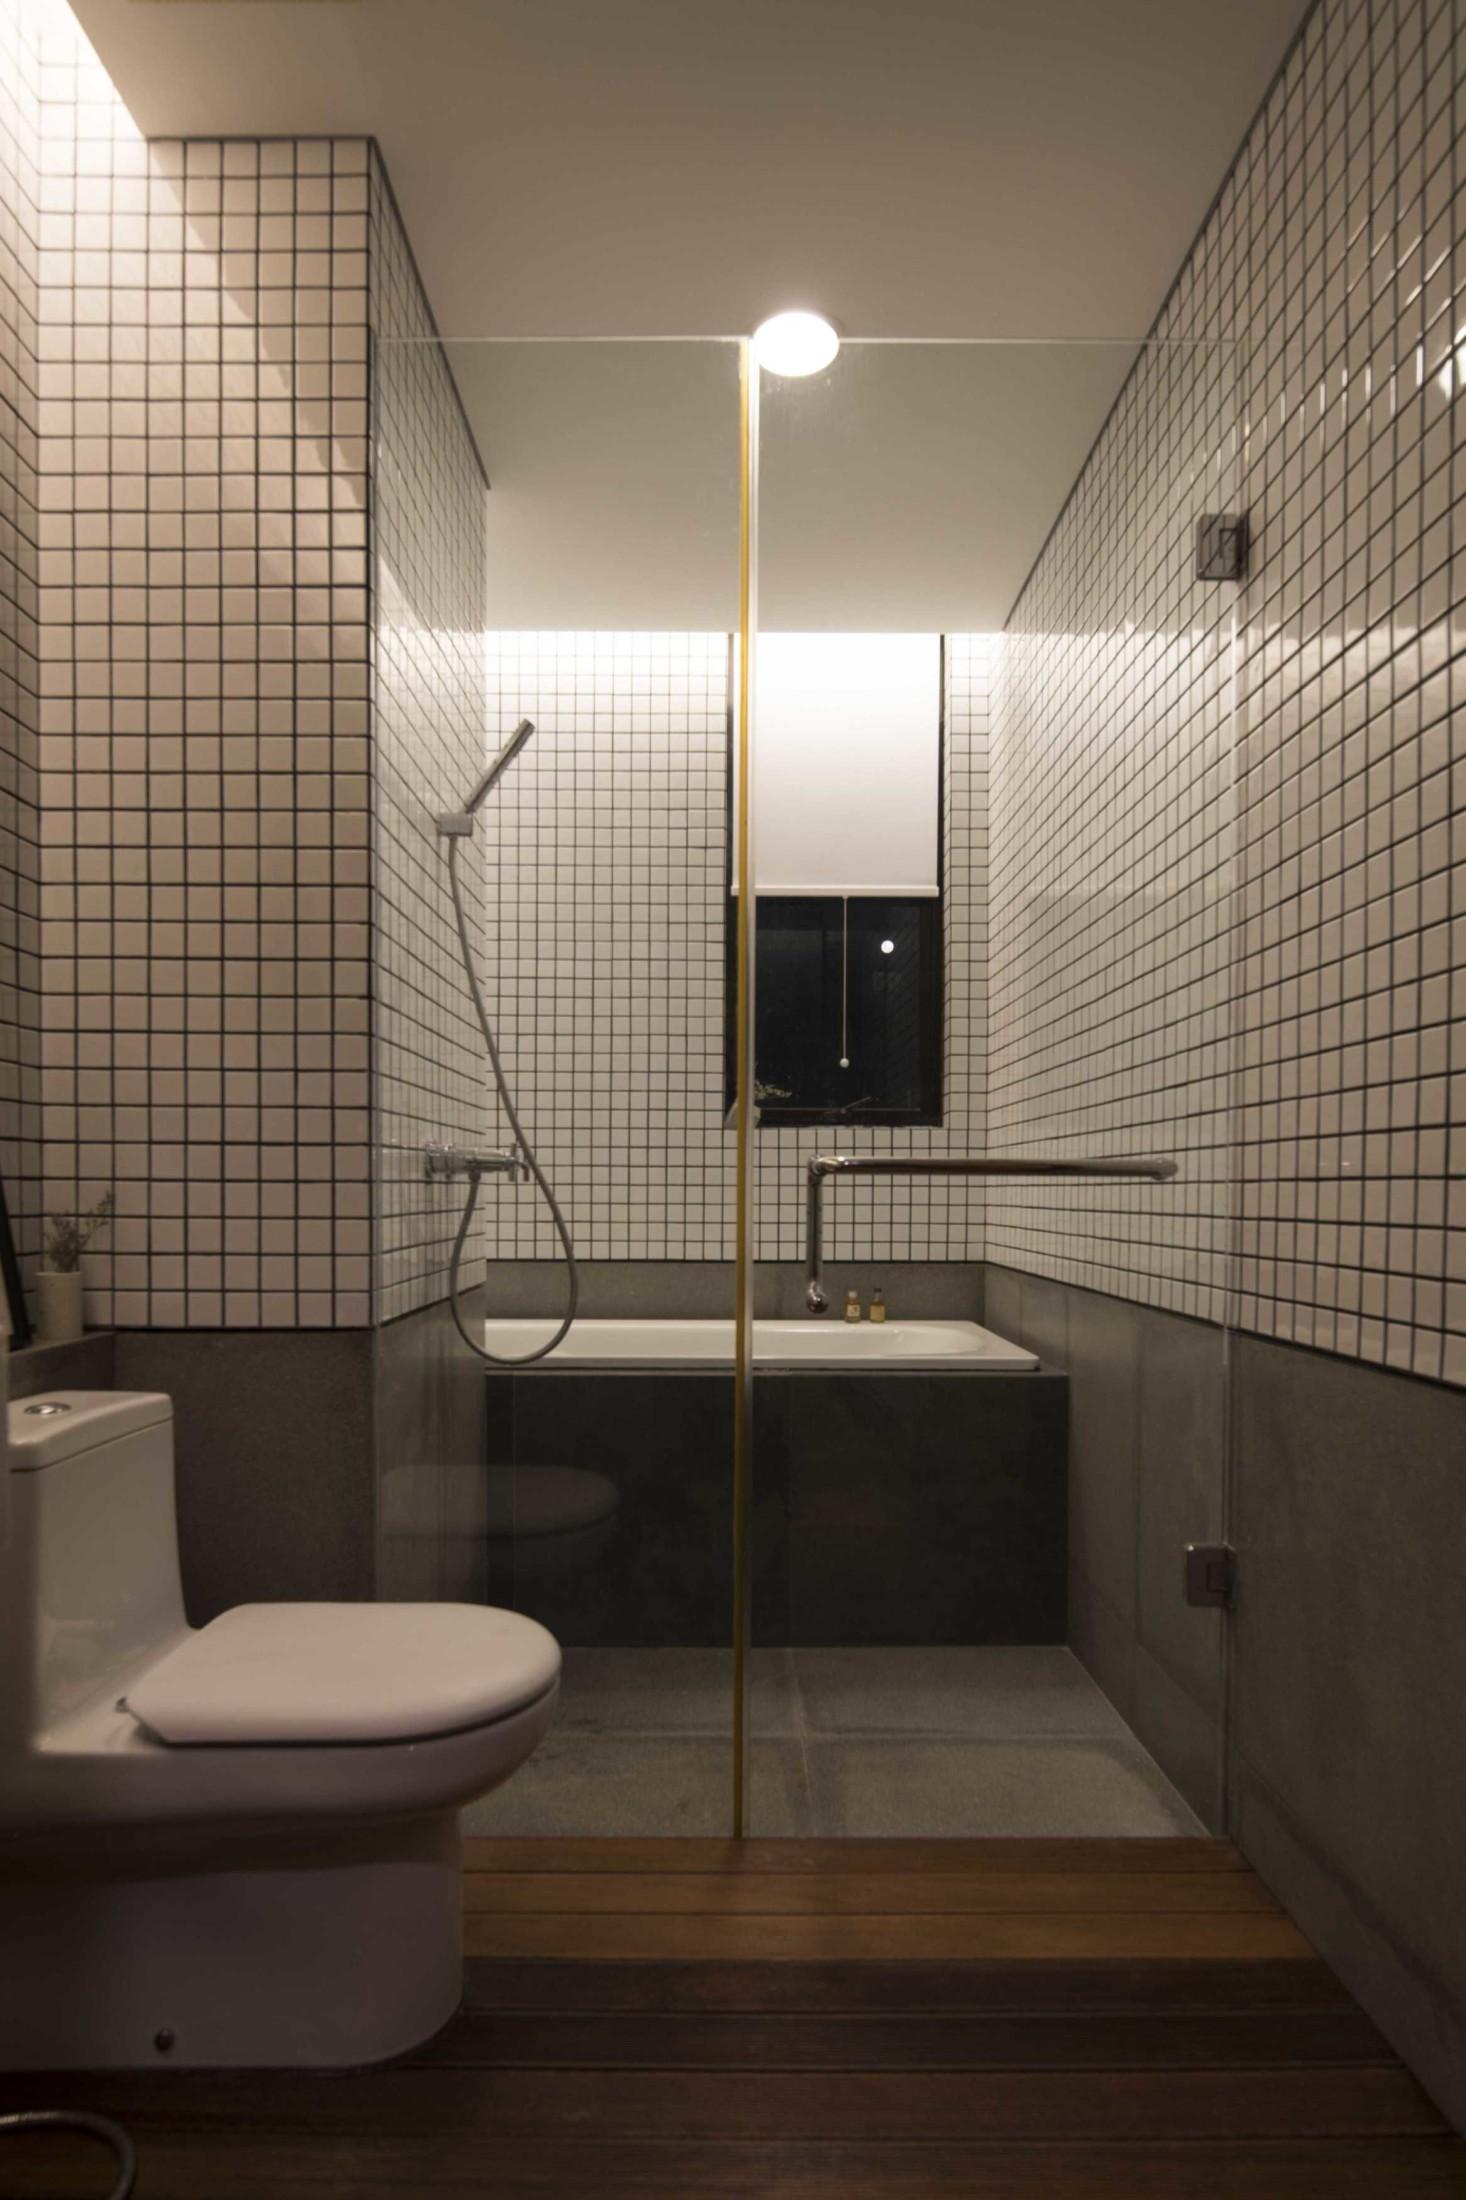 Kamar mandi mungil bergaya minimalis bernuansa alam (Sumber: arsitag.com)